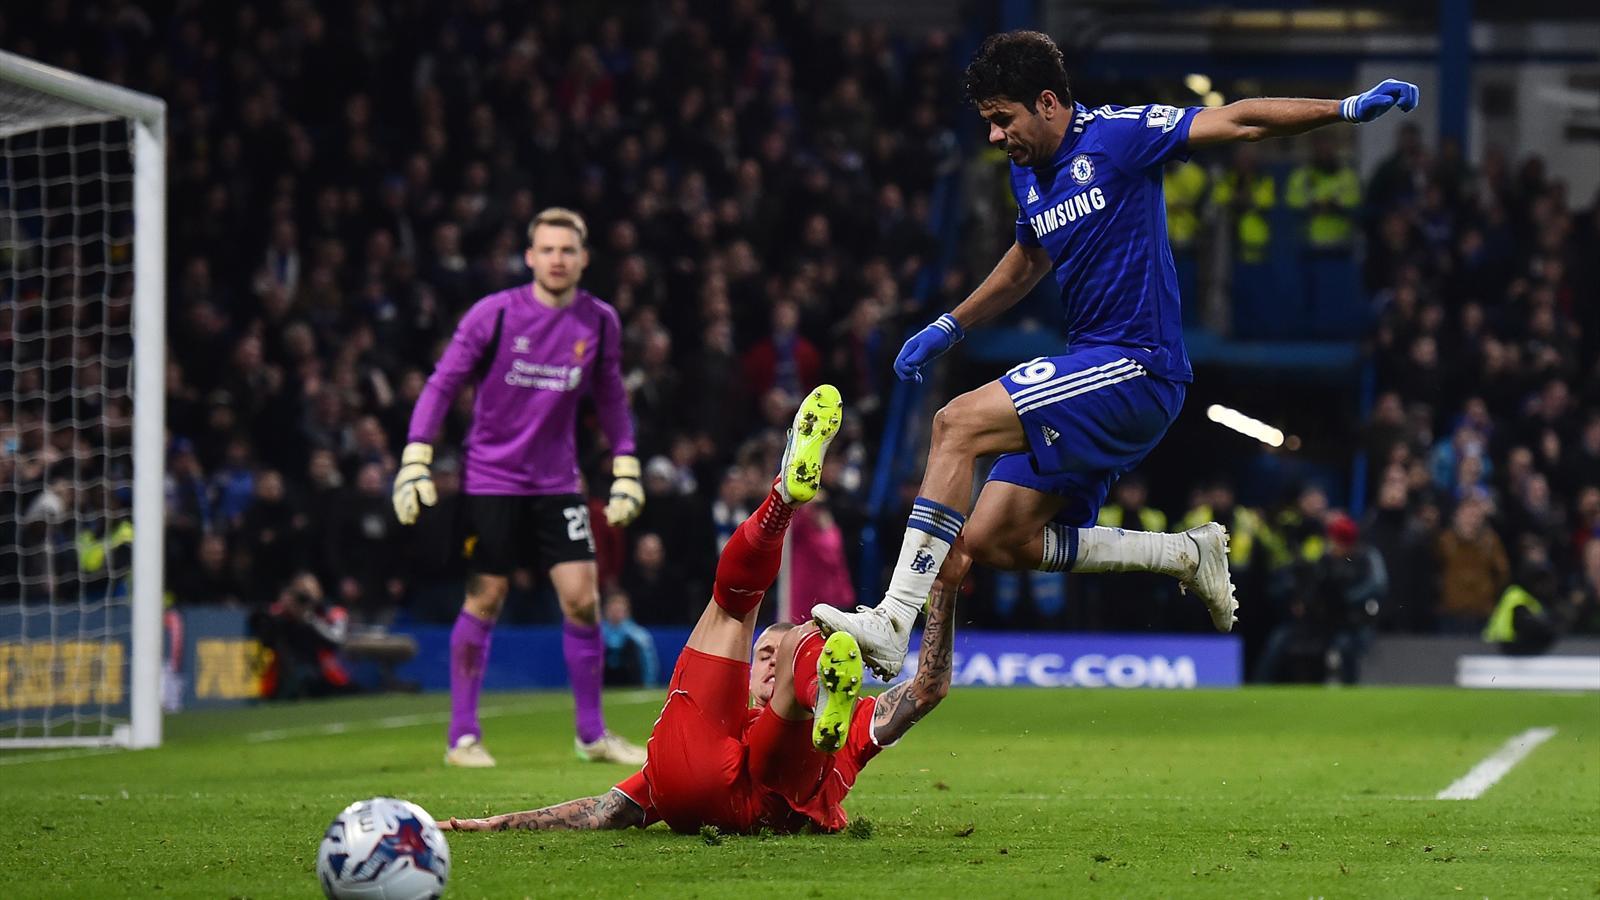 Chelsea 1-0 ap Liverpool